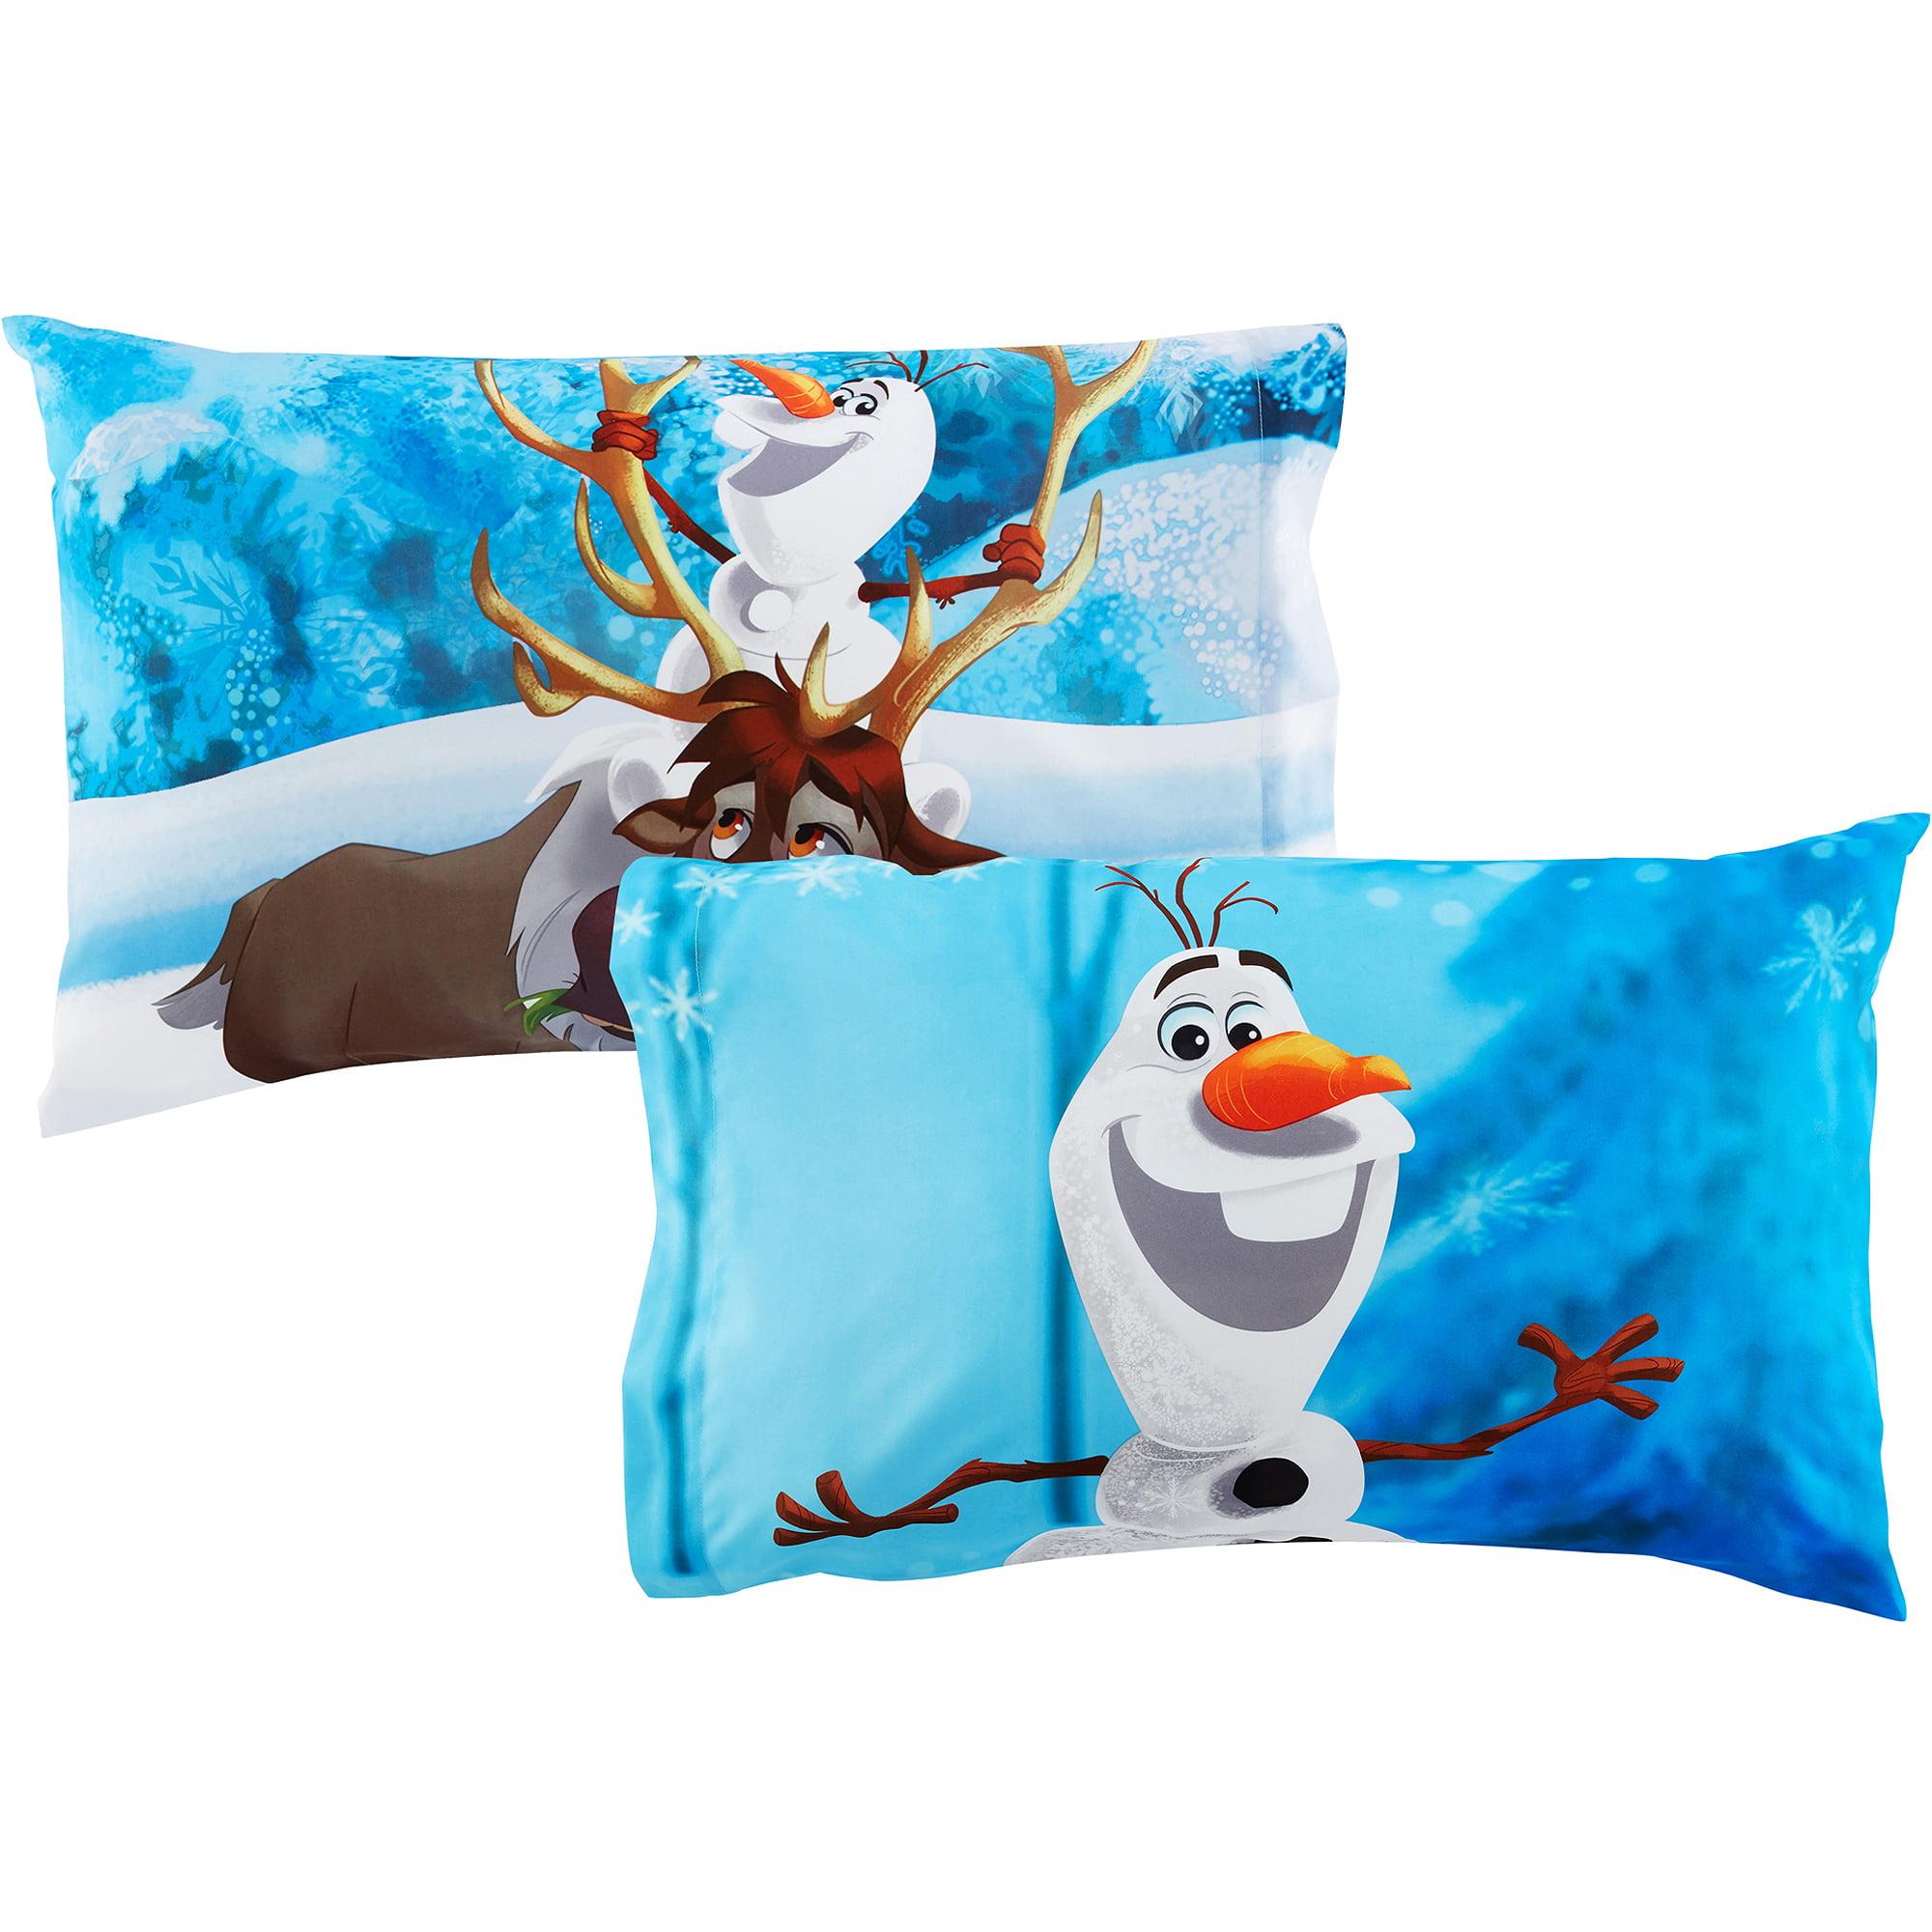 disney olaf 'build a snowman' bedding sheet set - walmart